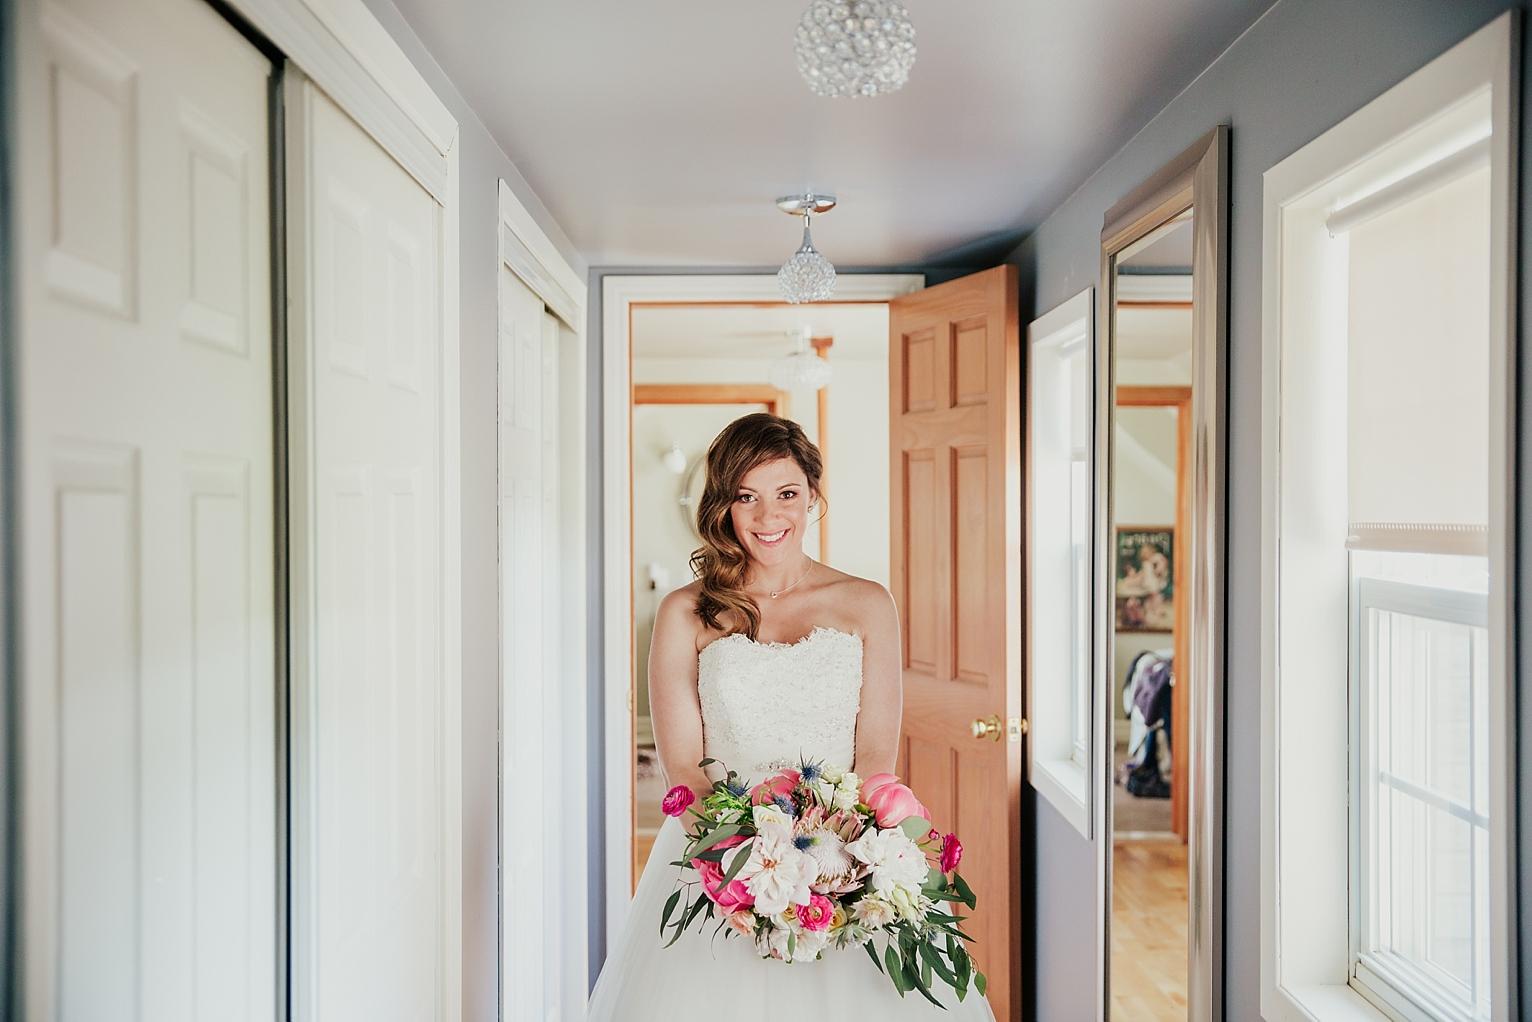 Vintage Bride getting ready